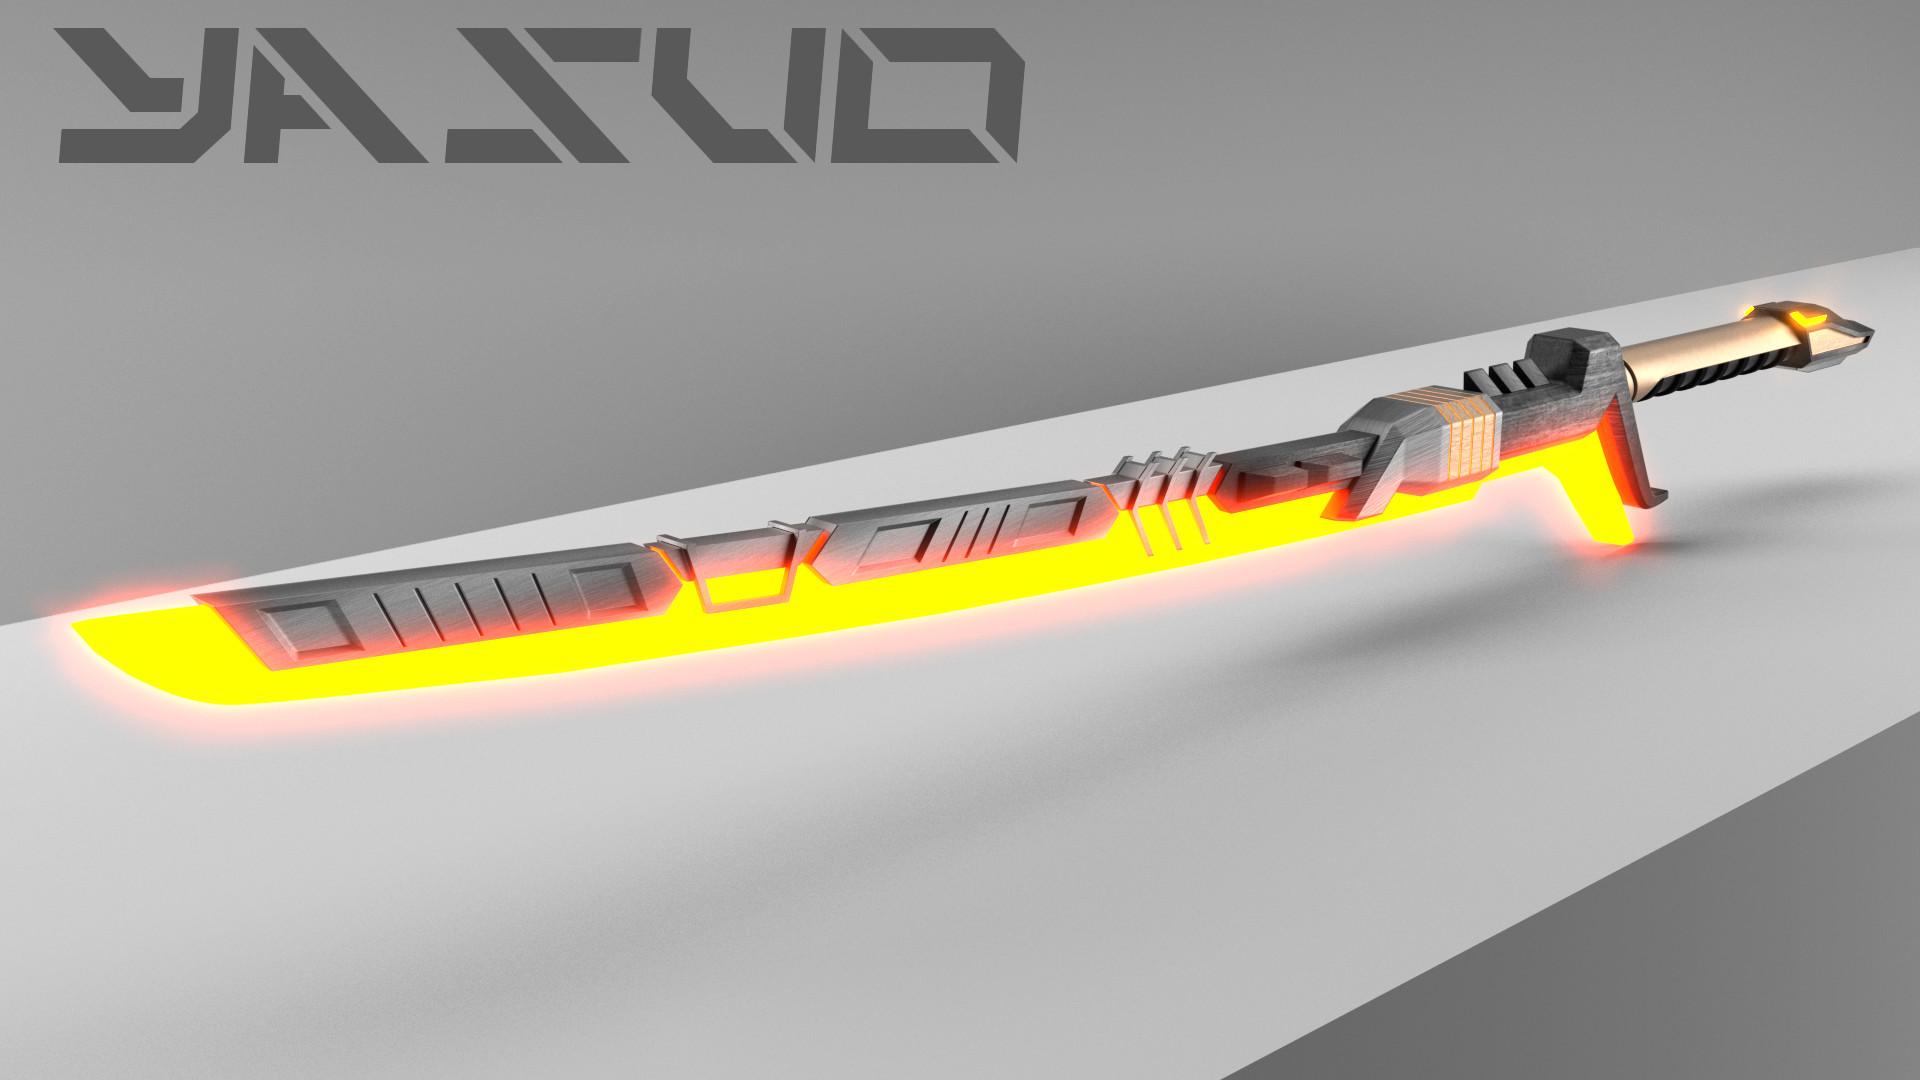 ... PROJECT: Yasuo sword - wallpaper v2.0 (darker) by tarbyk 1920x1080